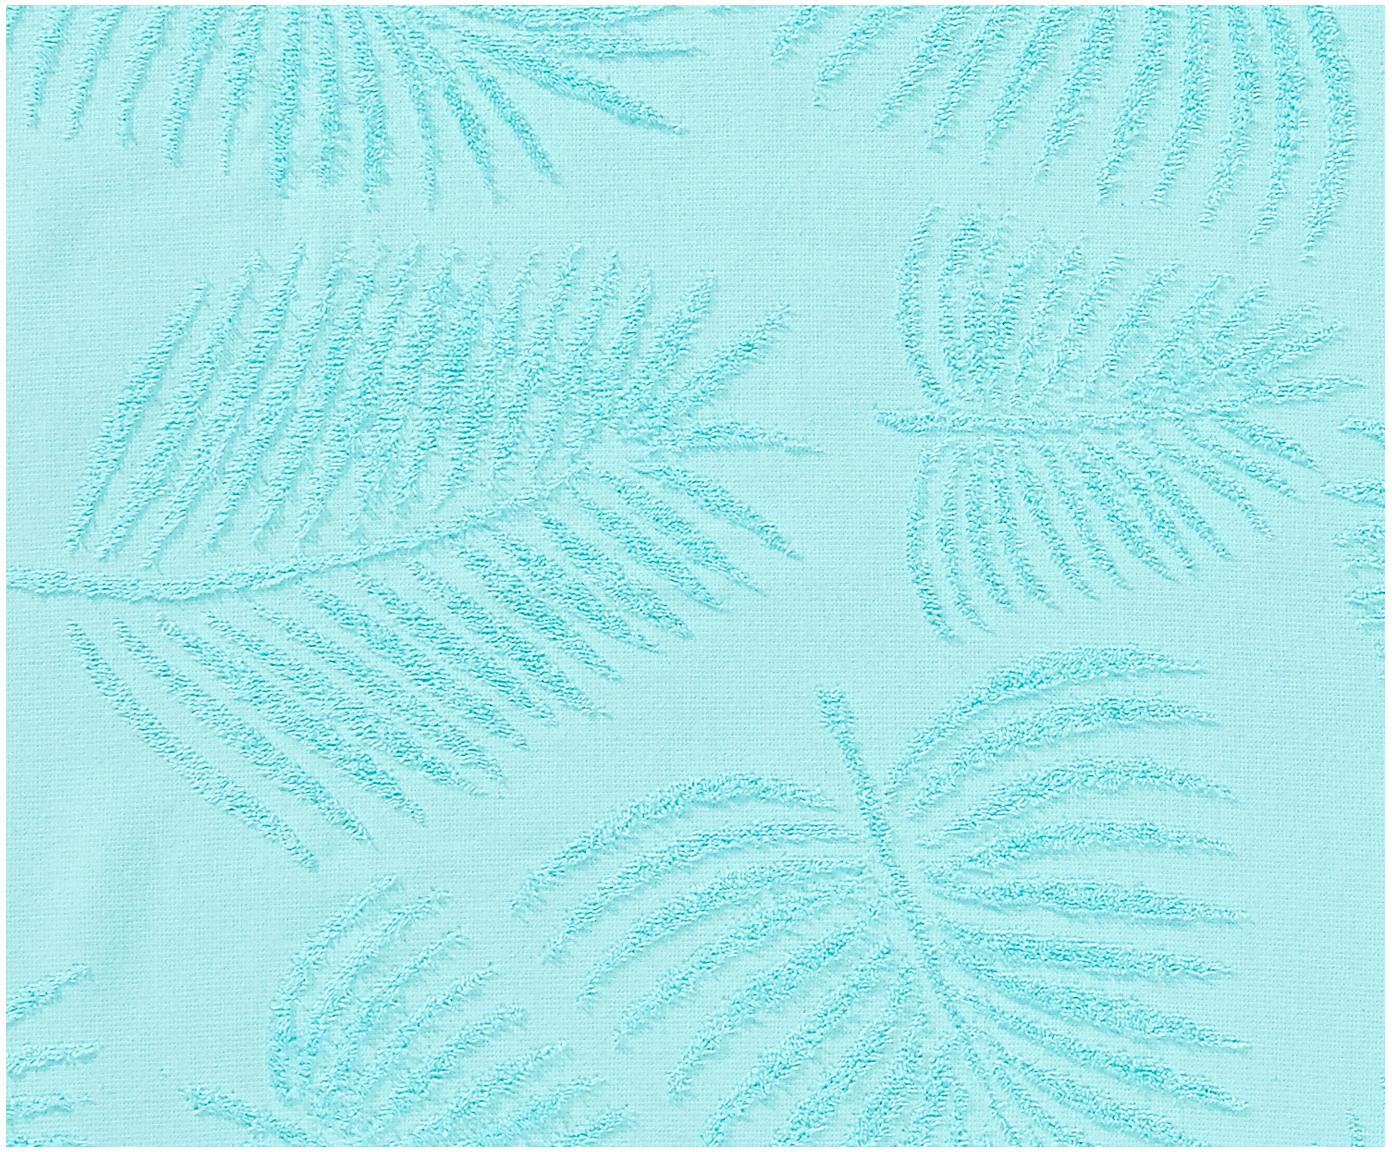 Ręcznik plażowy Capri Palm Leaves, Turkusowy, S 90 x D 160 cm